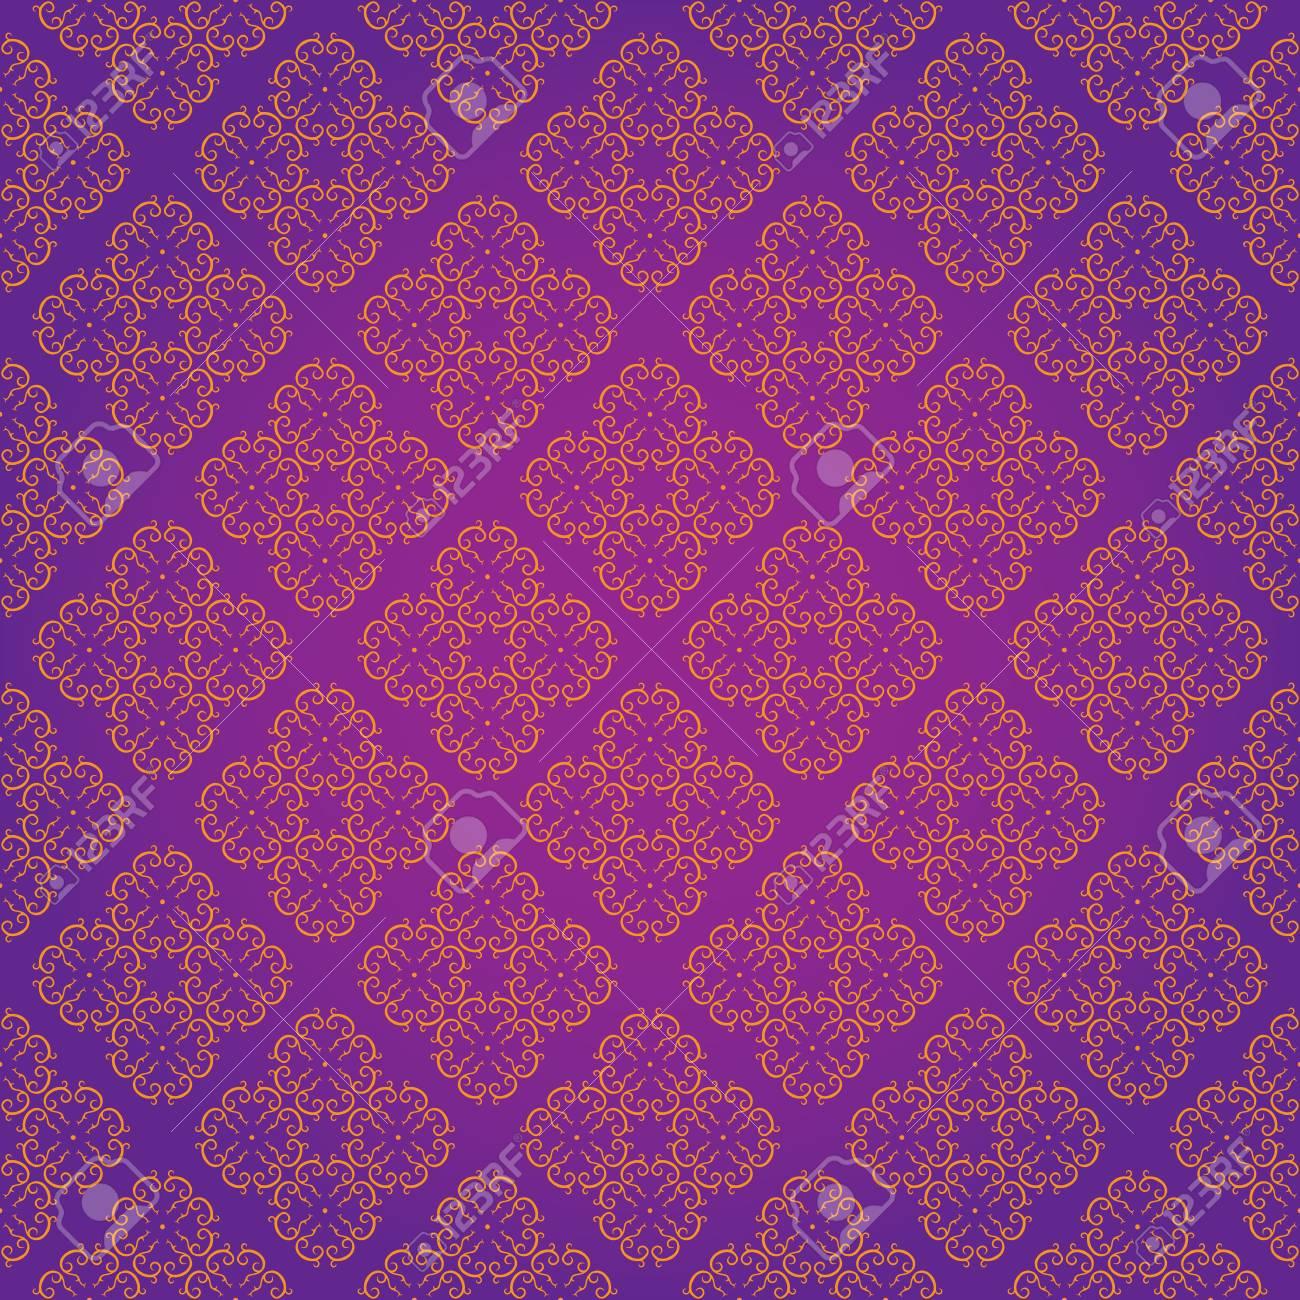 Vector Illustration of Vintage Wallpaper Seamless Pattern Original Design Stock Vector - 12798526